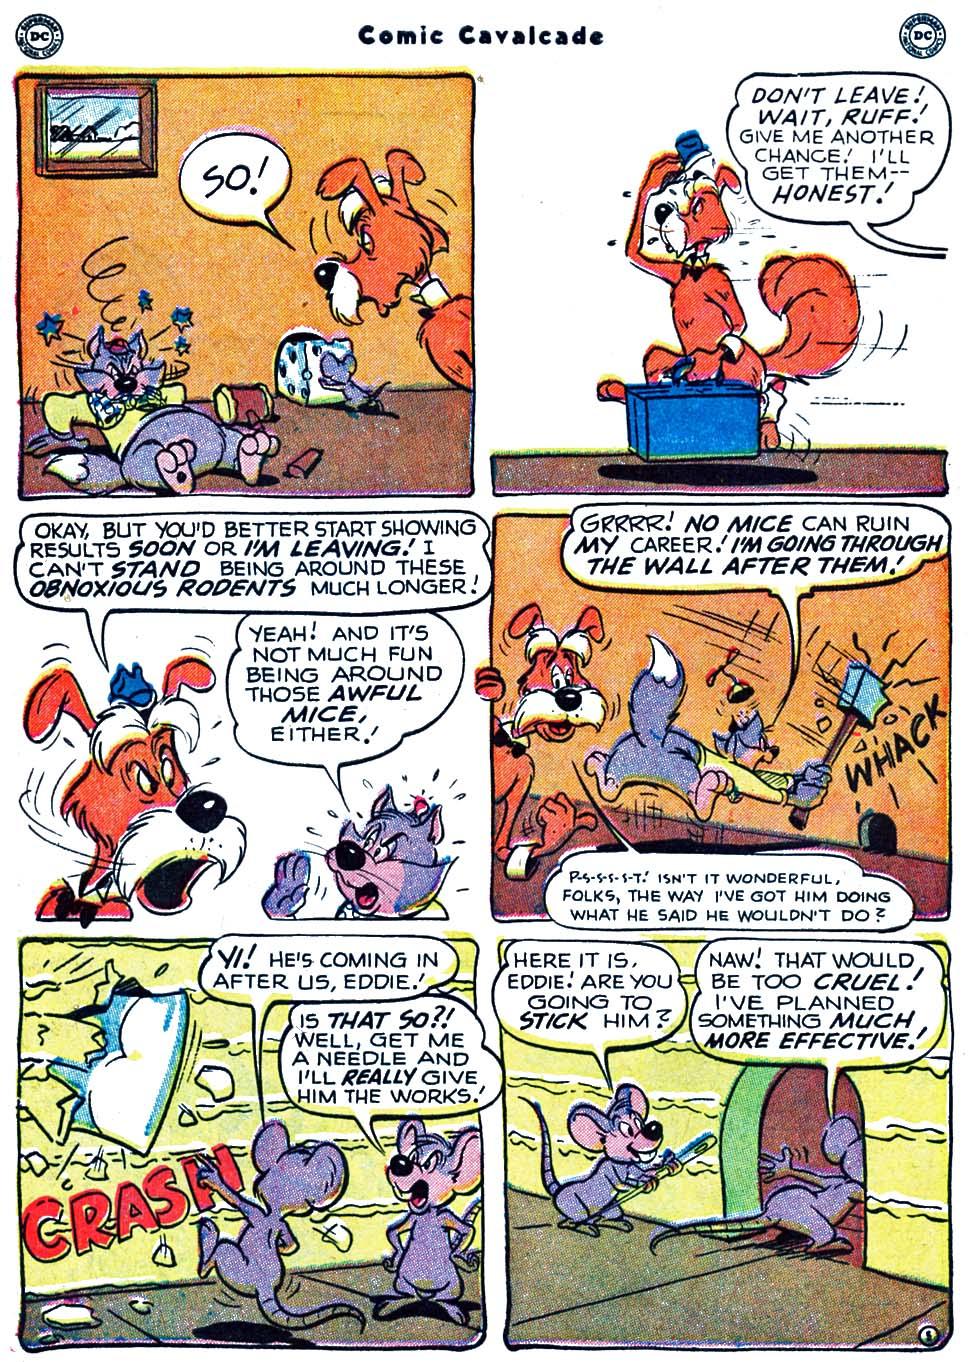 Comic Cavalcade issue 40 - Page 56